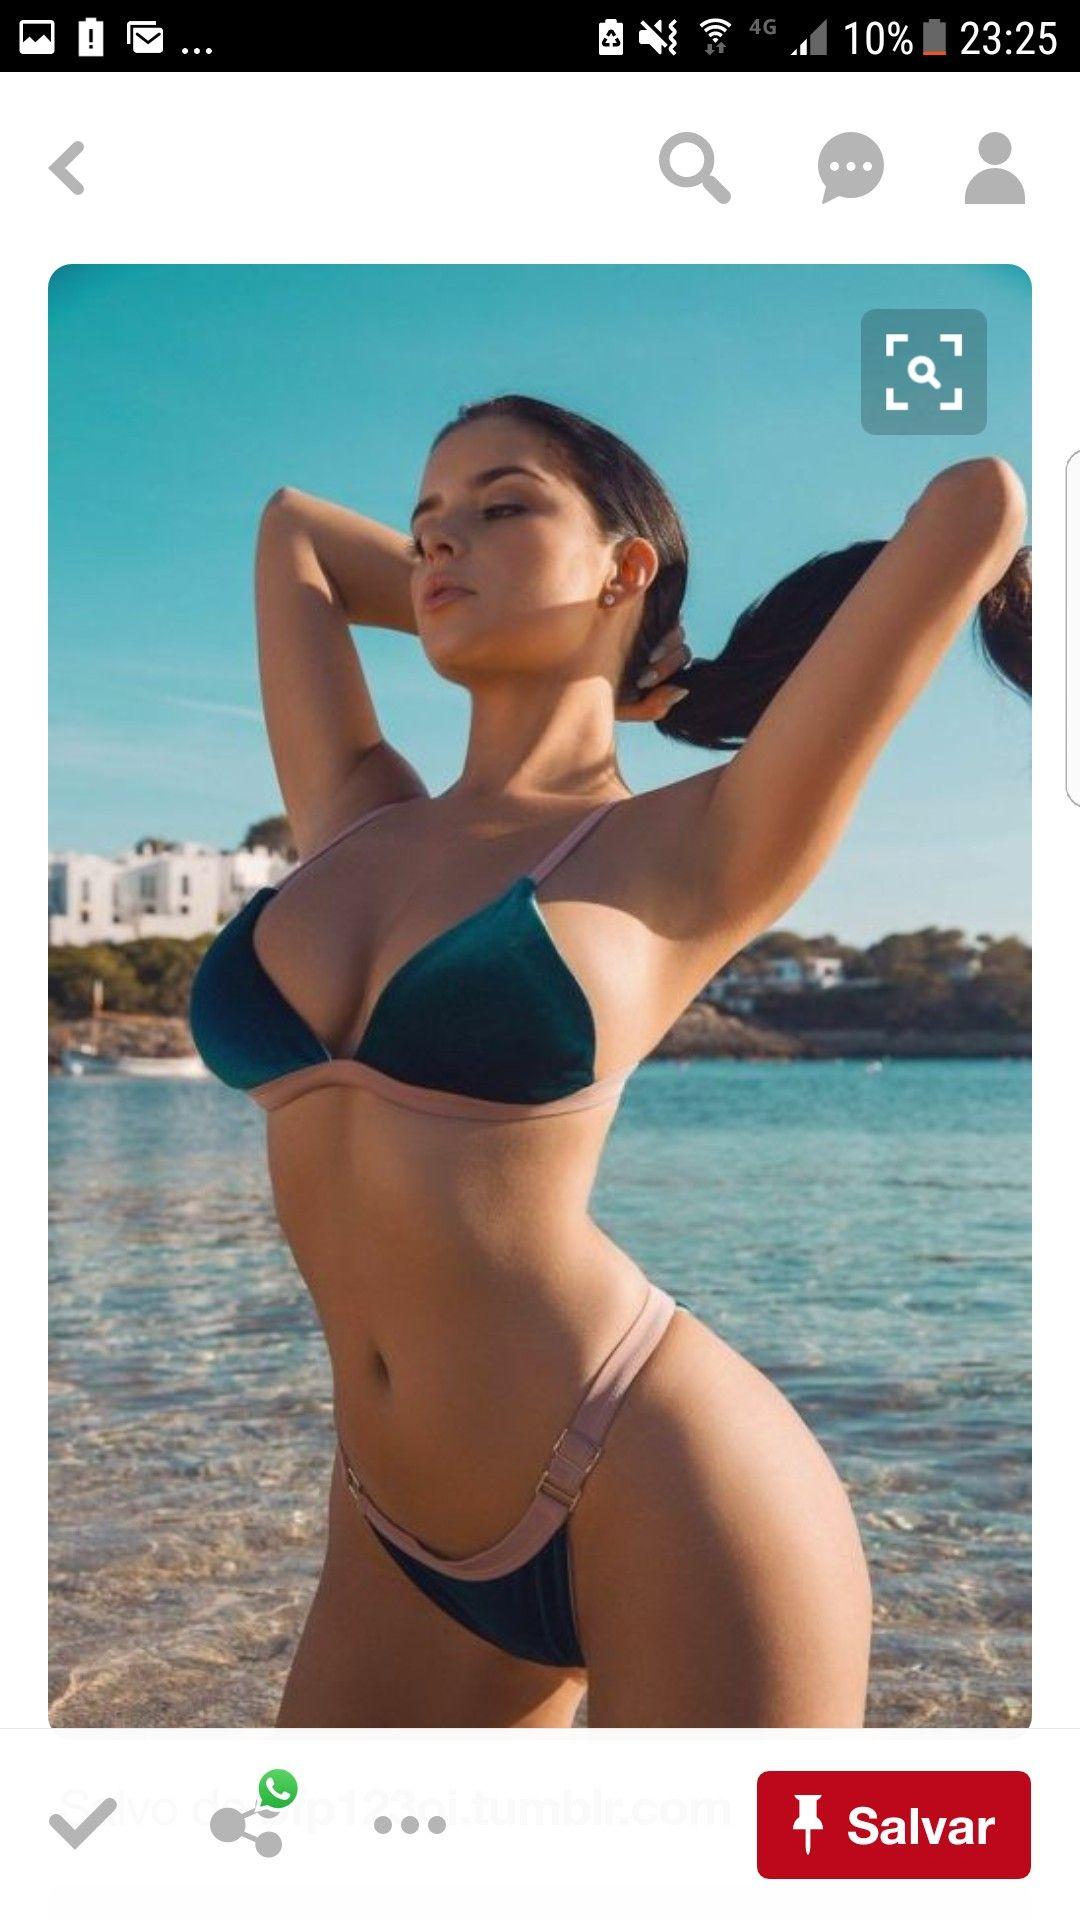 5efca2648 Bikini Dievčatá, Dámske Plavky, Plavky, Krásne Ženy, Morské Panny, Ženy S